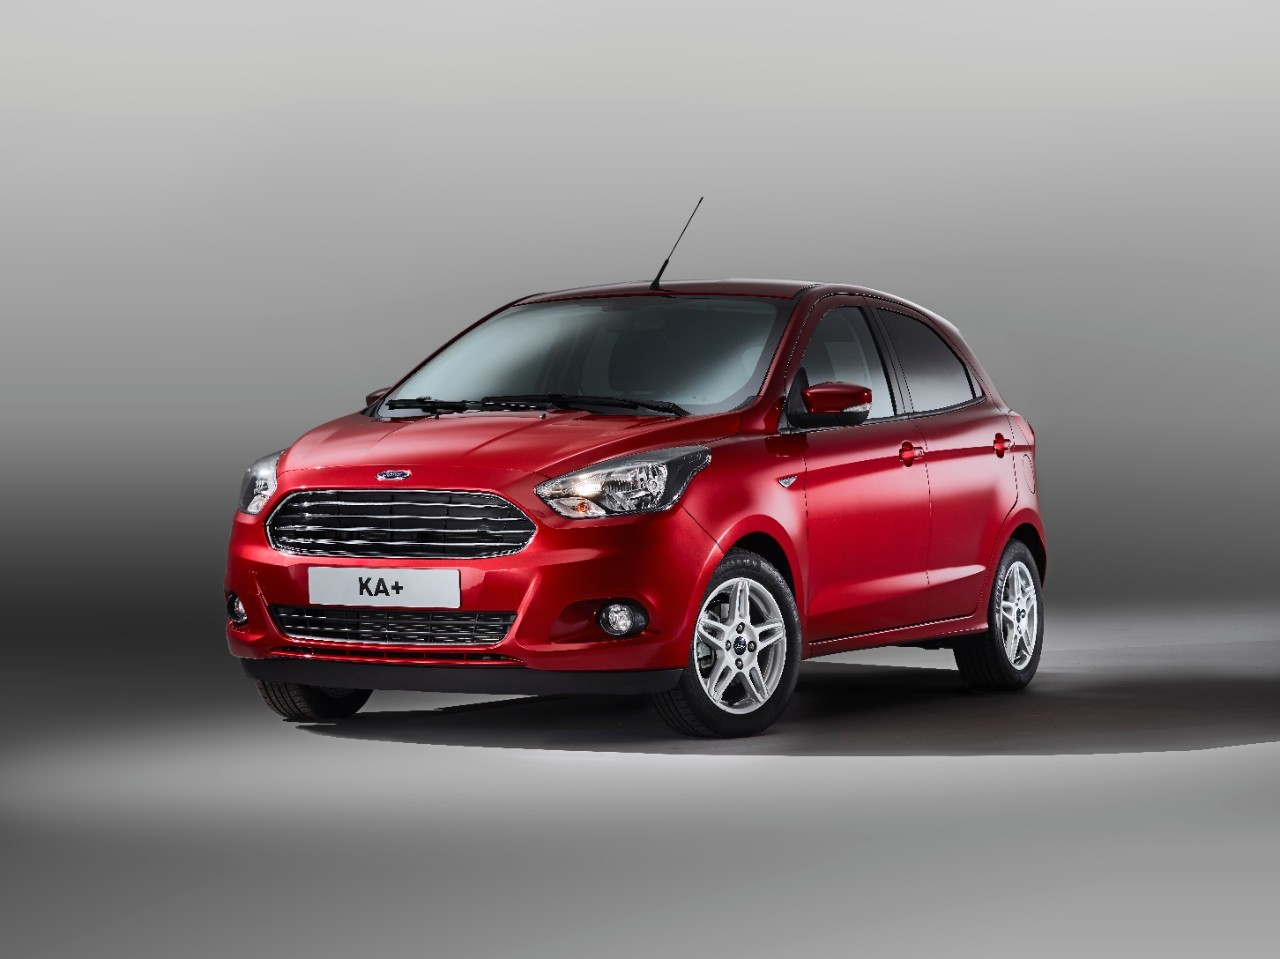 Nuova Ford Ka Plus: foto